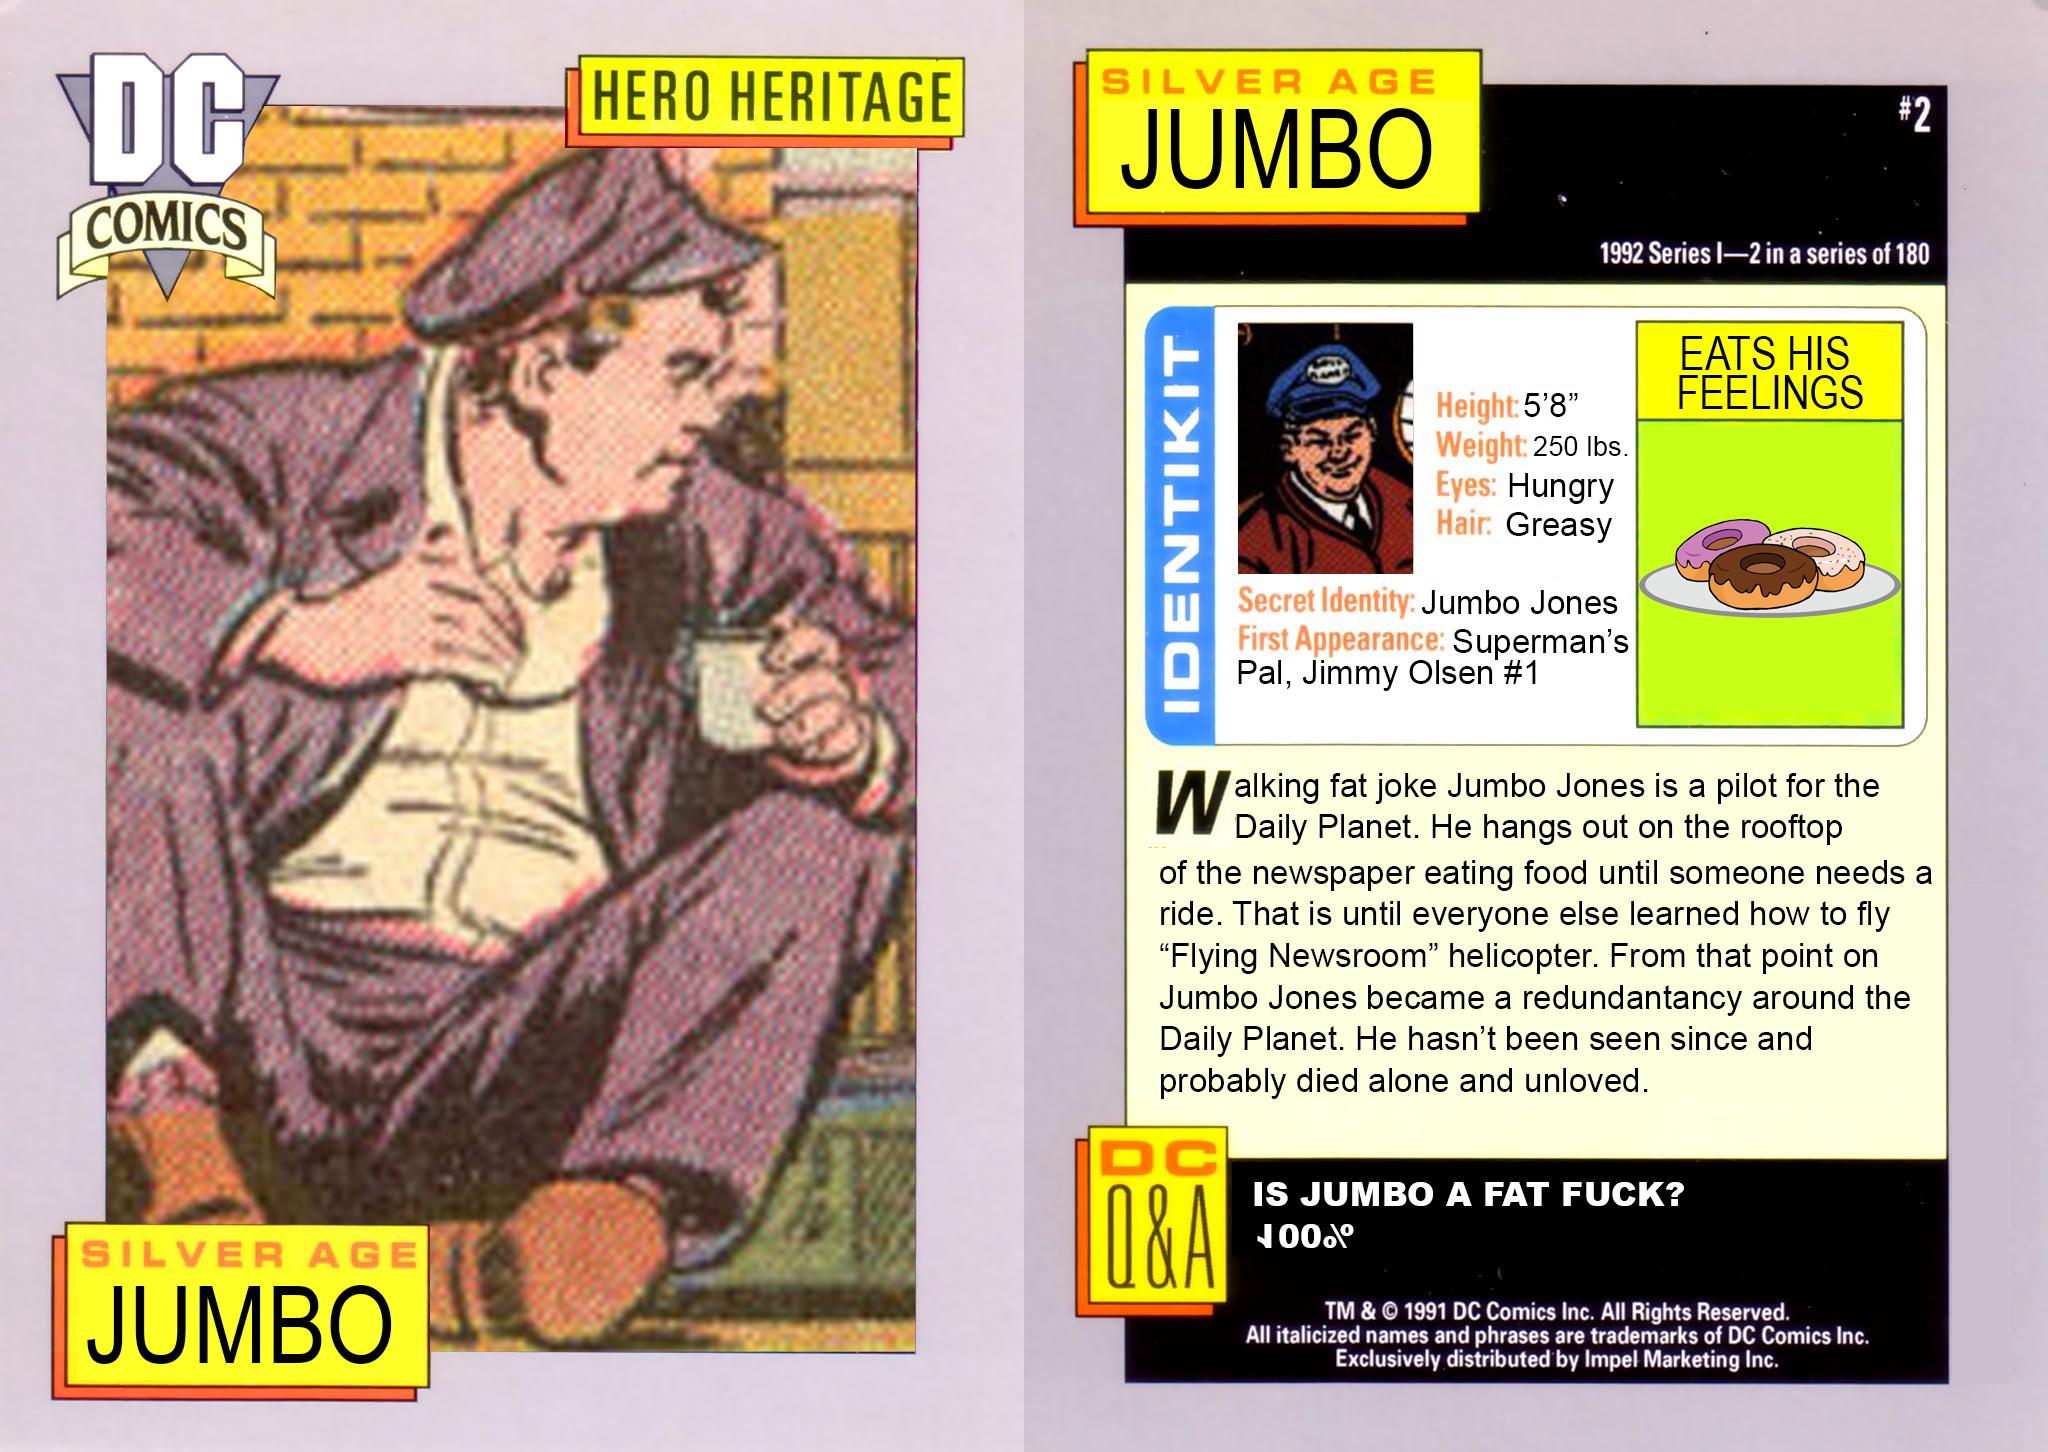 Jumbo-Trading-Card.jpg